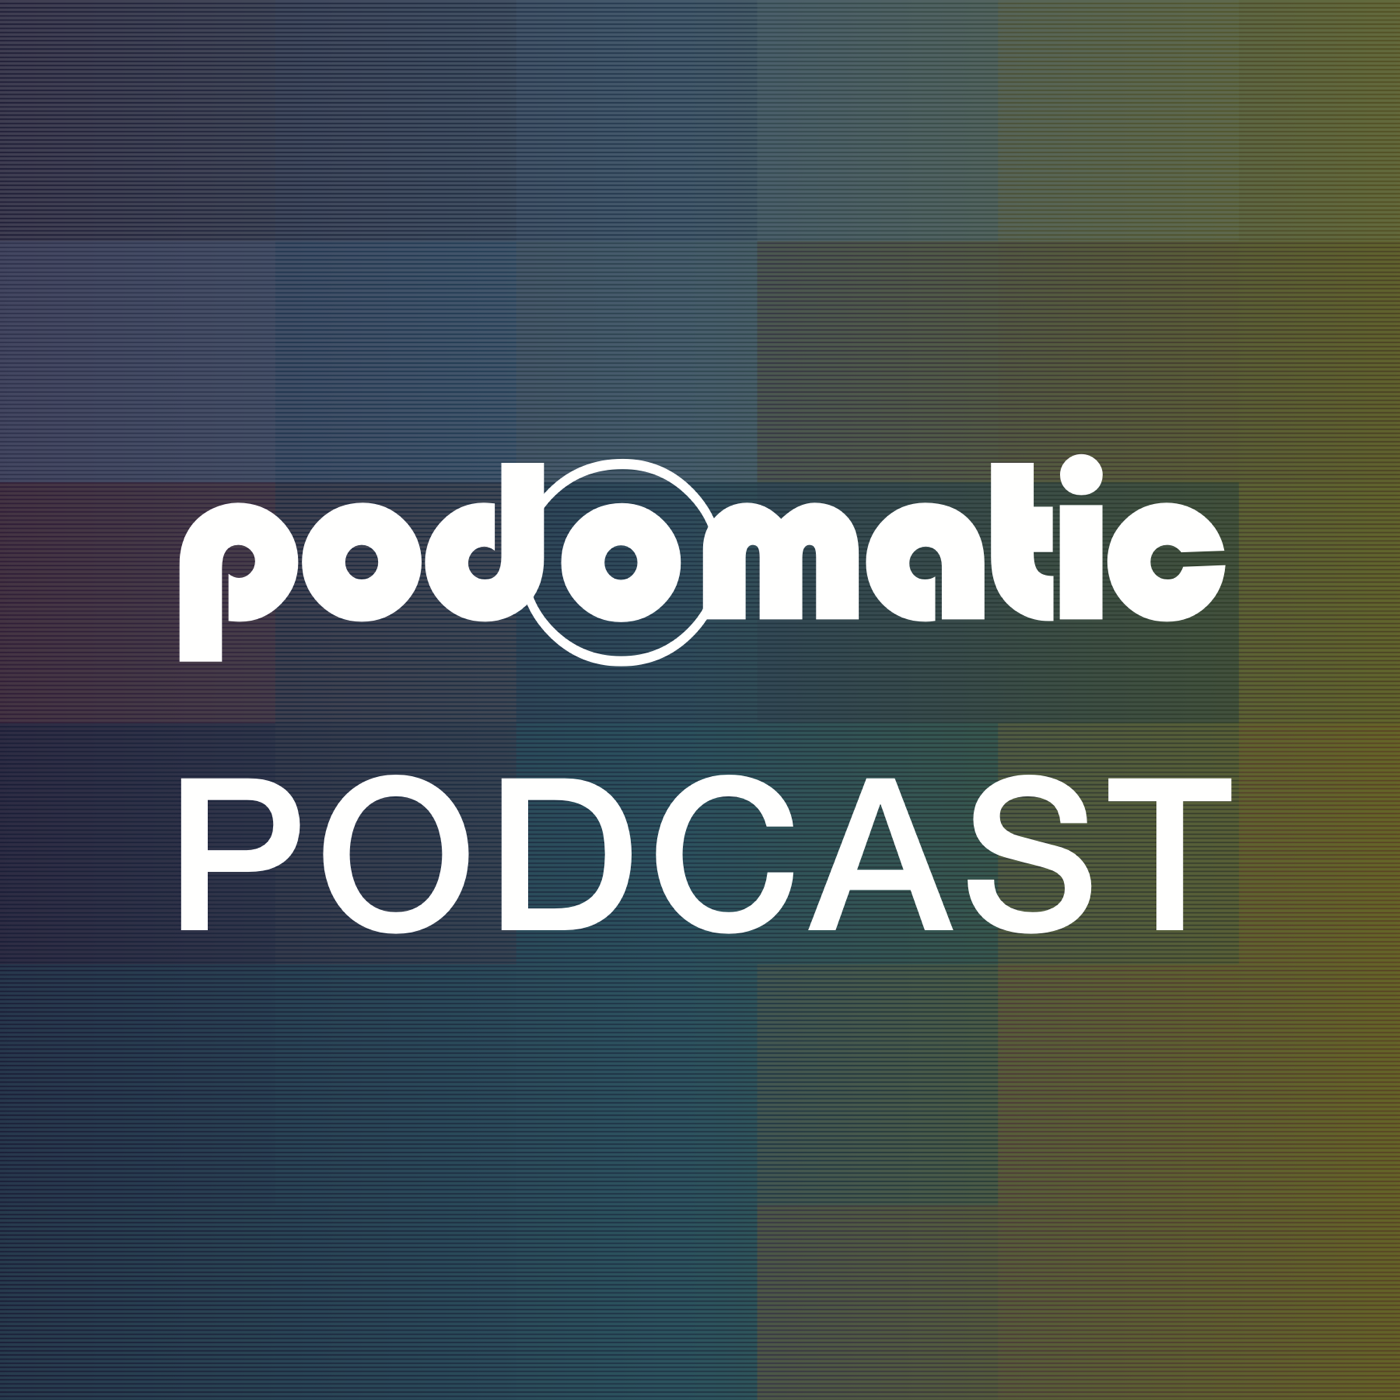 joe stephen's Podcast